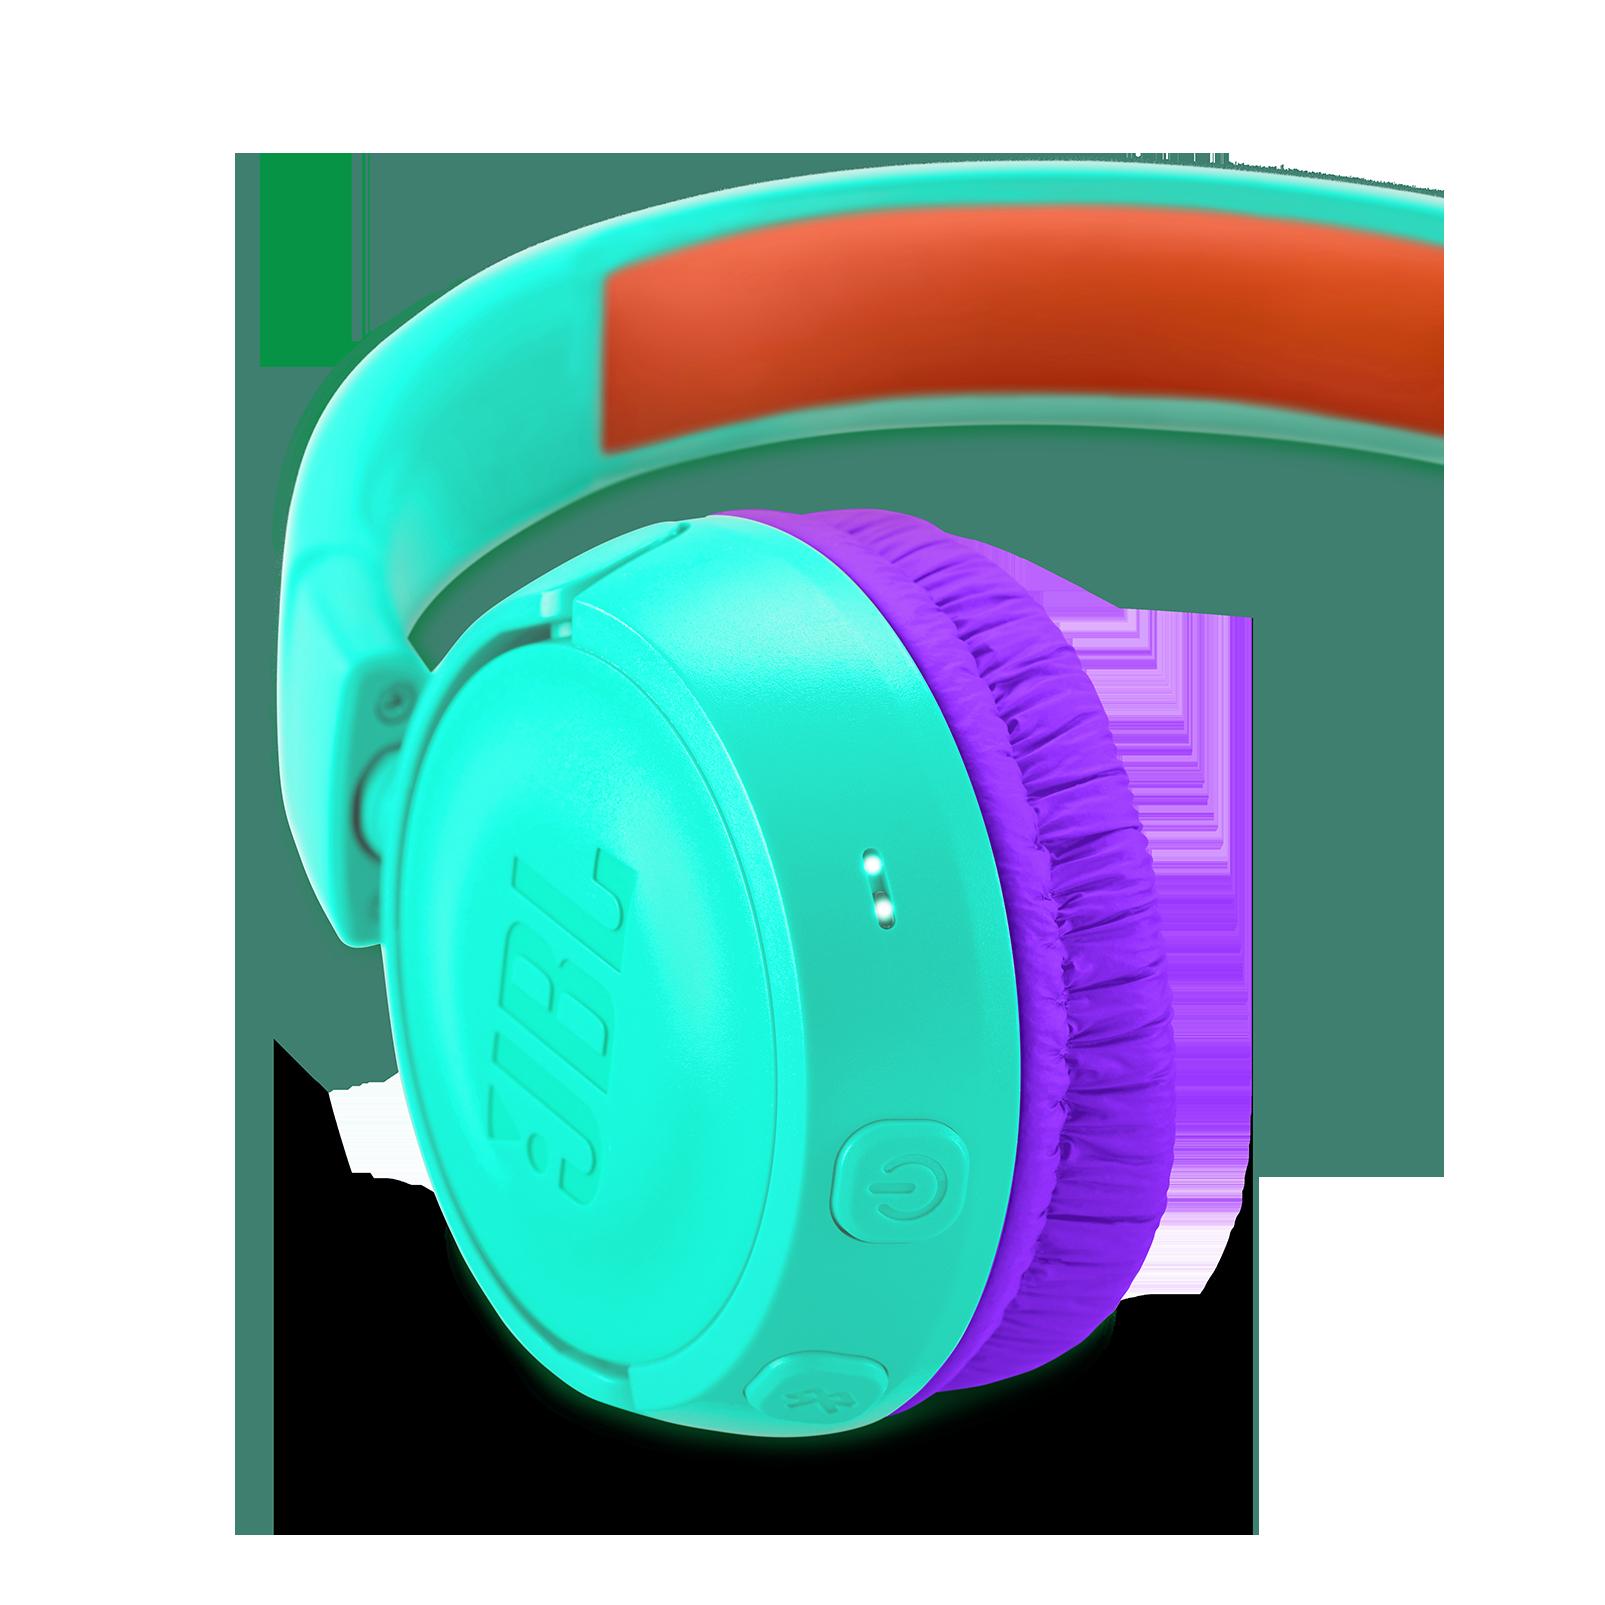 JBL JR300BT - Teal - Kids Wireless on-ear headphones - Detailshot 2